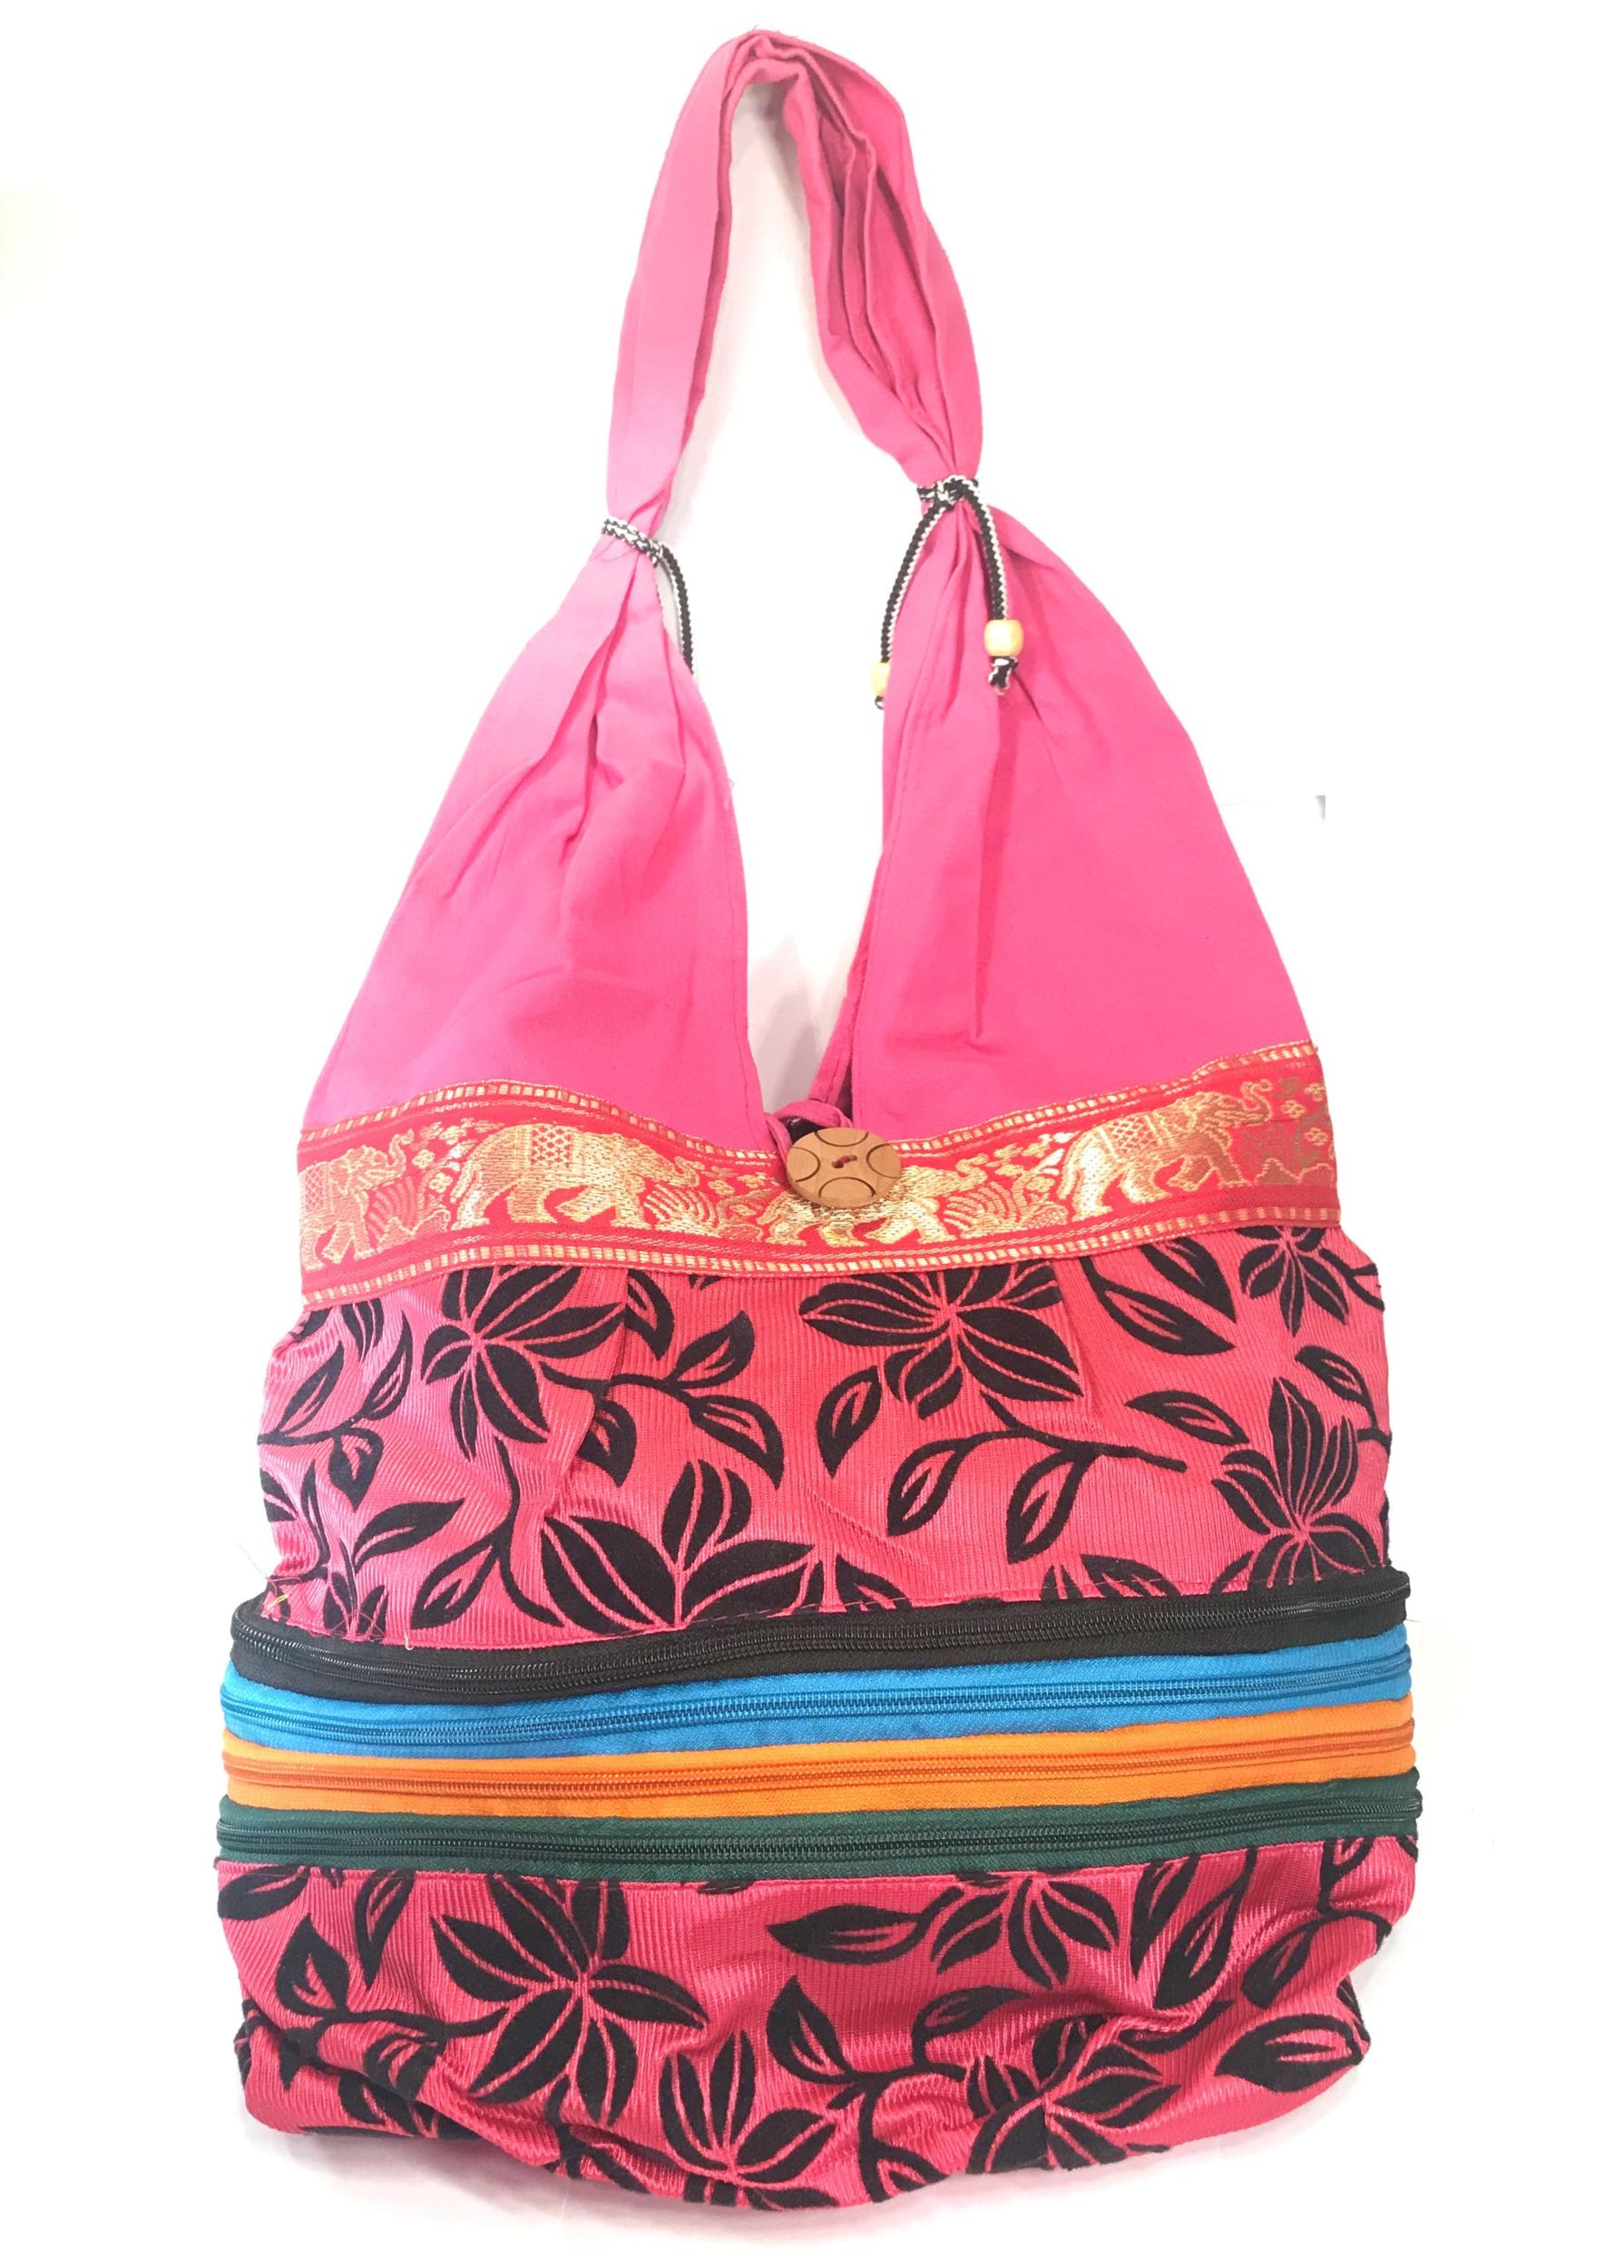 Sac tissu coloré indien